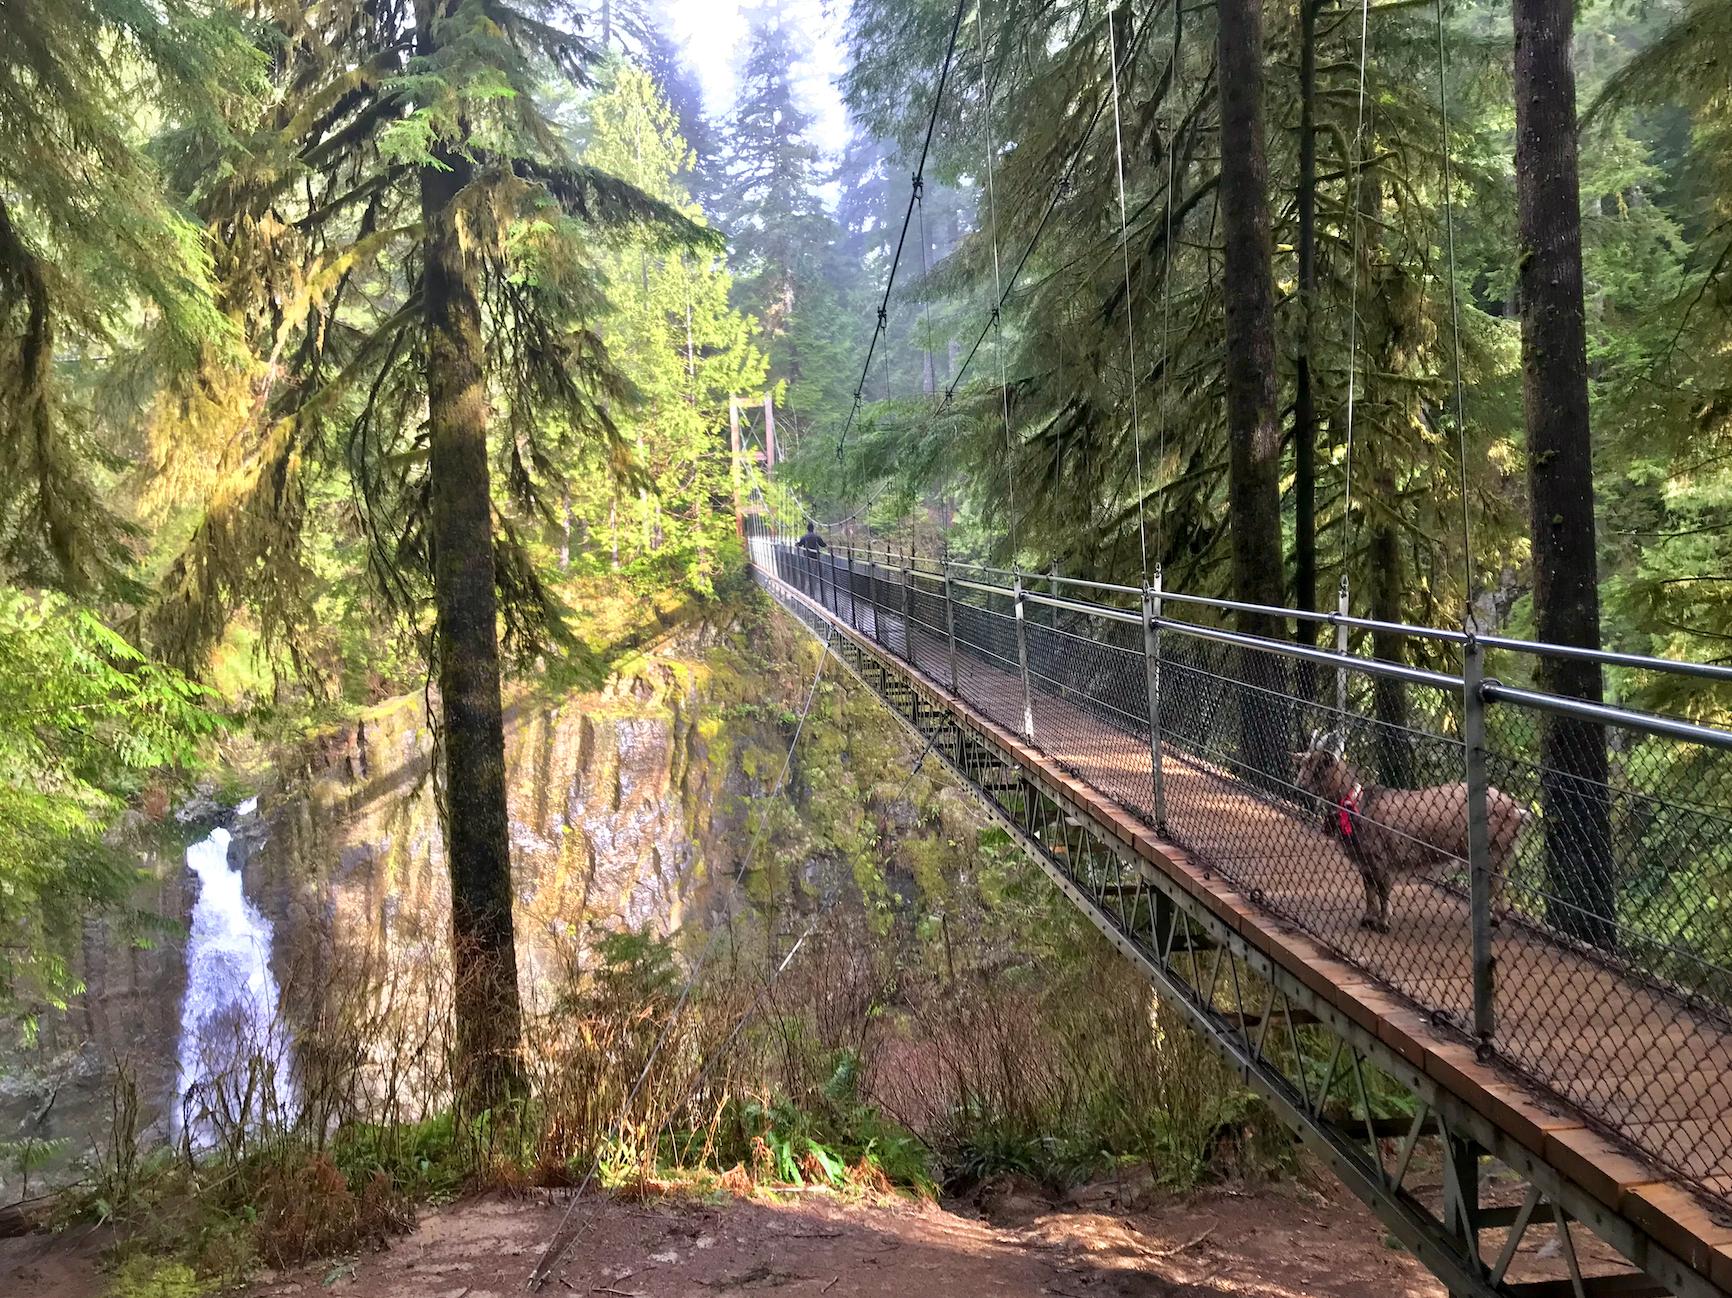 A lone figure crosses a suspension footbridge.